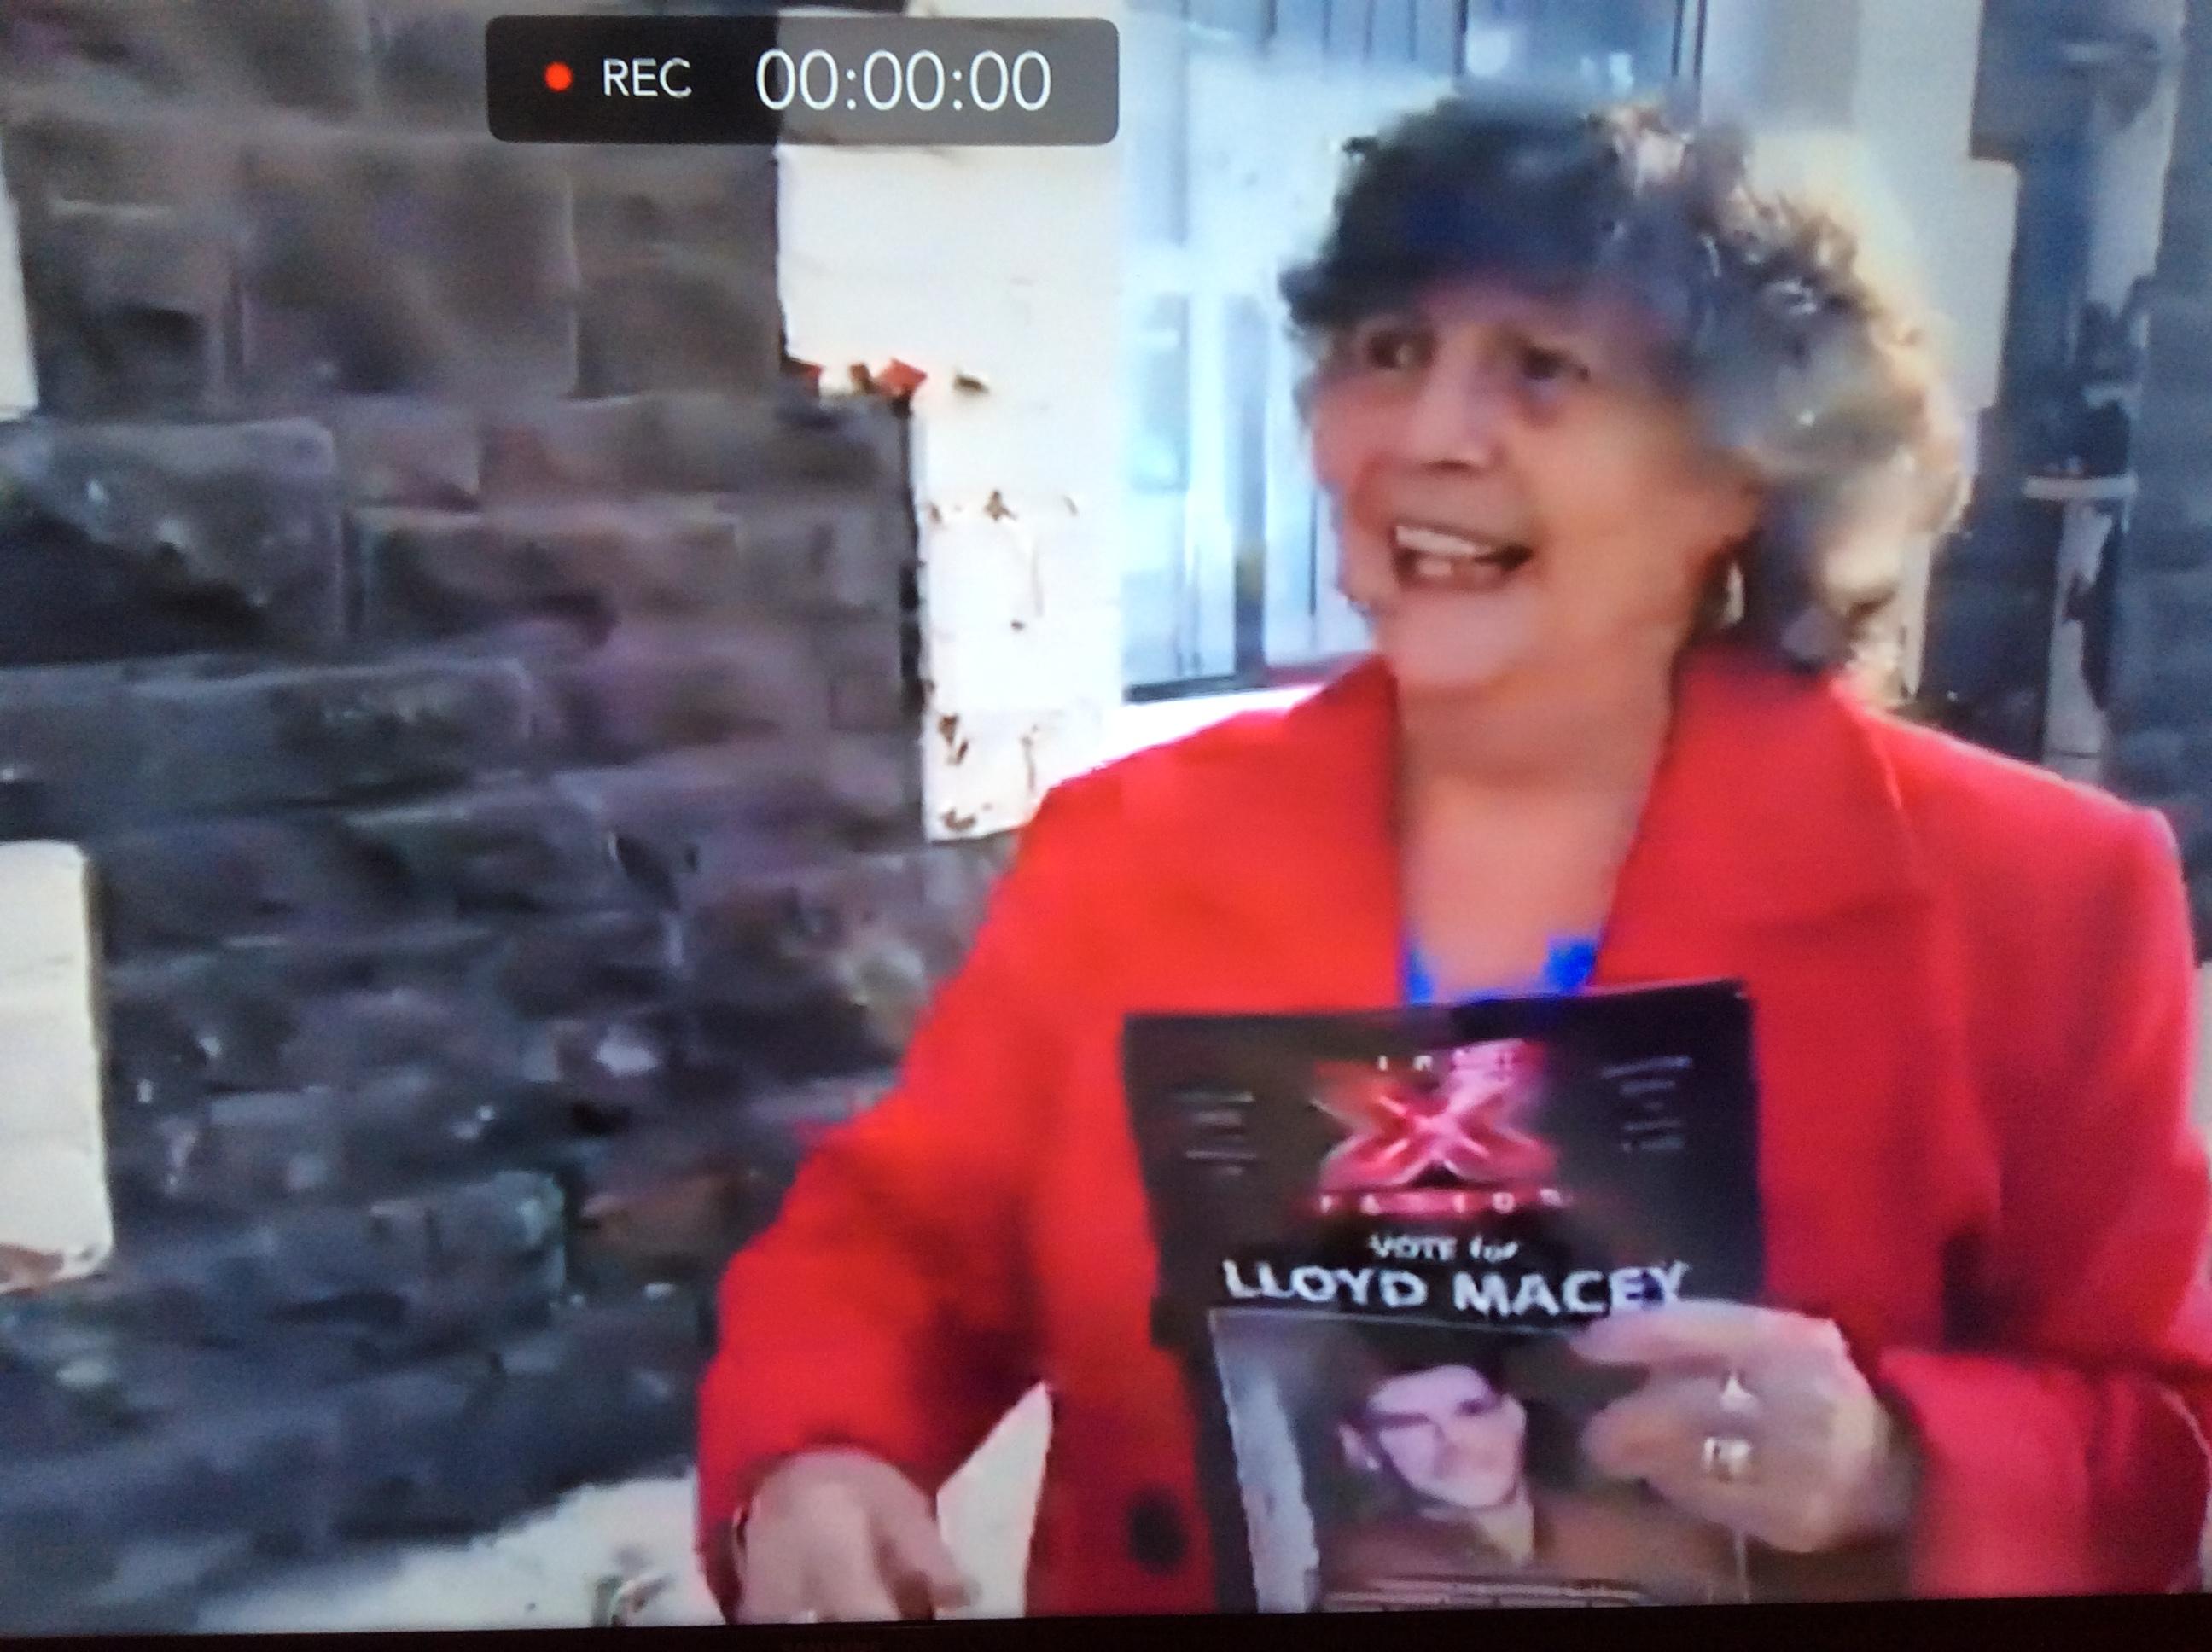 Lloyd Macey's nan on week 2 of The X Factor